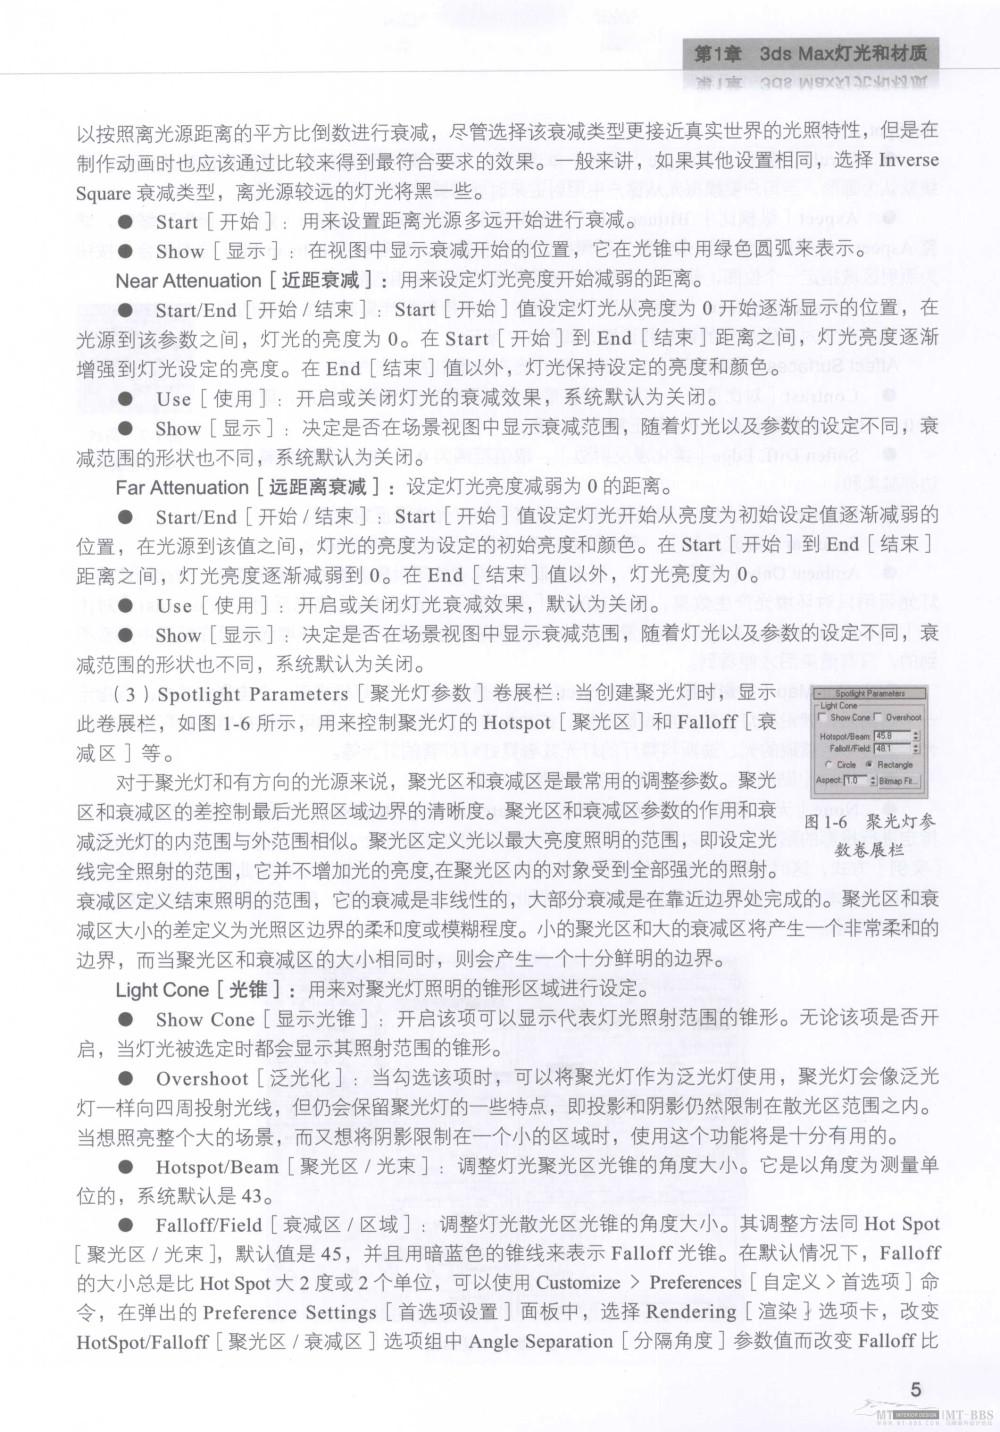 水晶石技法-3ds_Max&VRay室内空间表现_水晶石技法-3ds_Max&VRay室内空间表现_页面_011.jpg